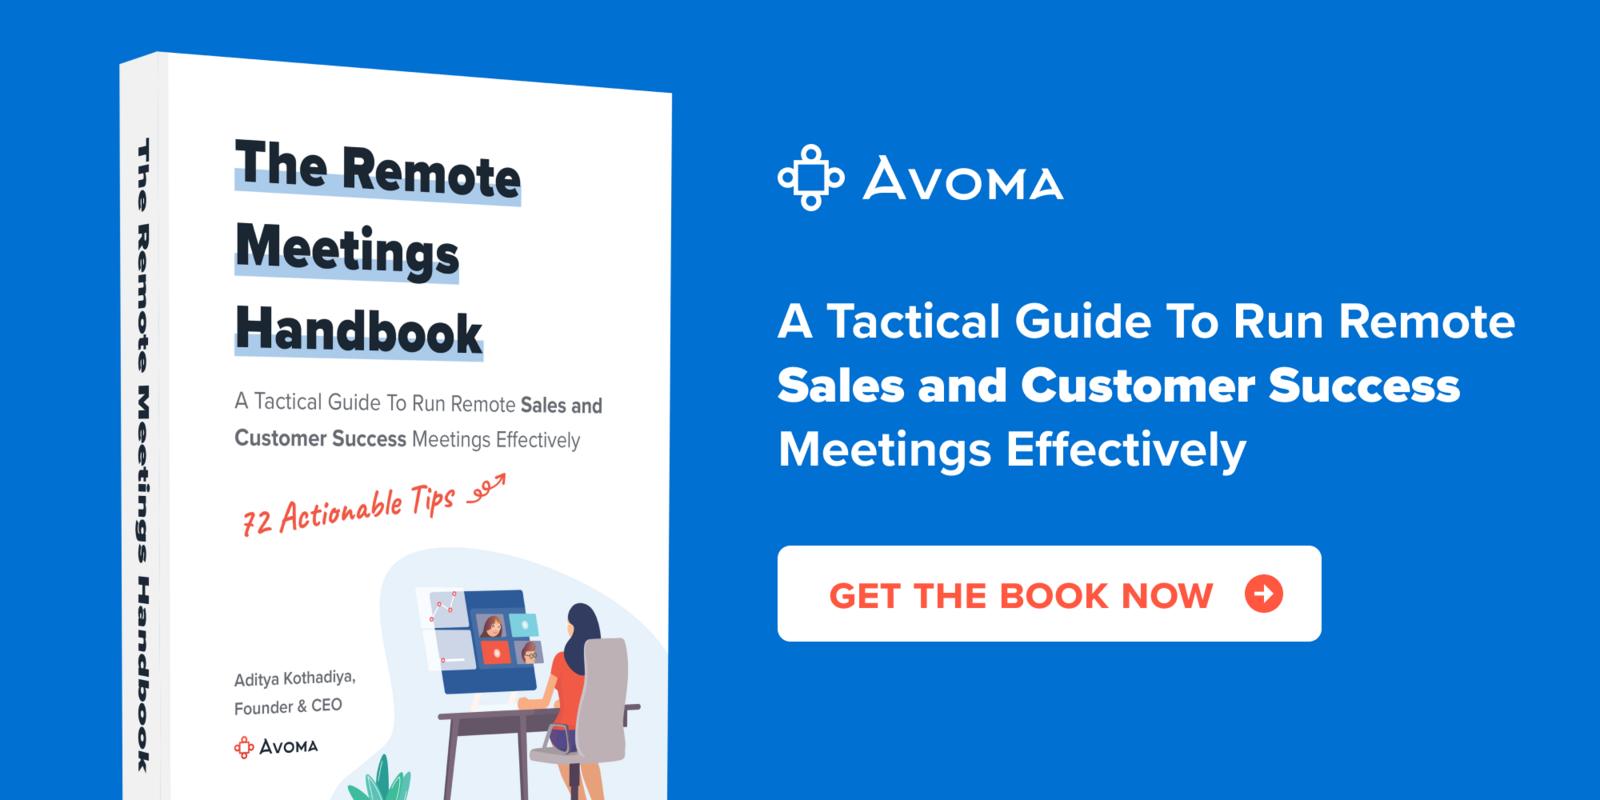 The Remote Meetings Handbook by Avoma